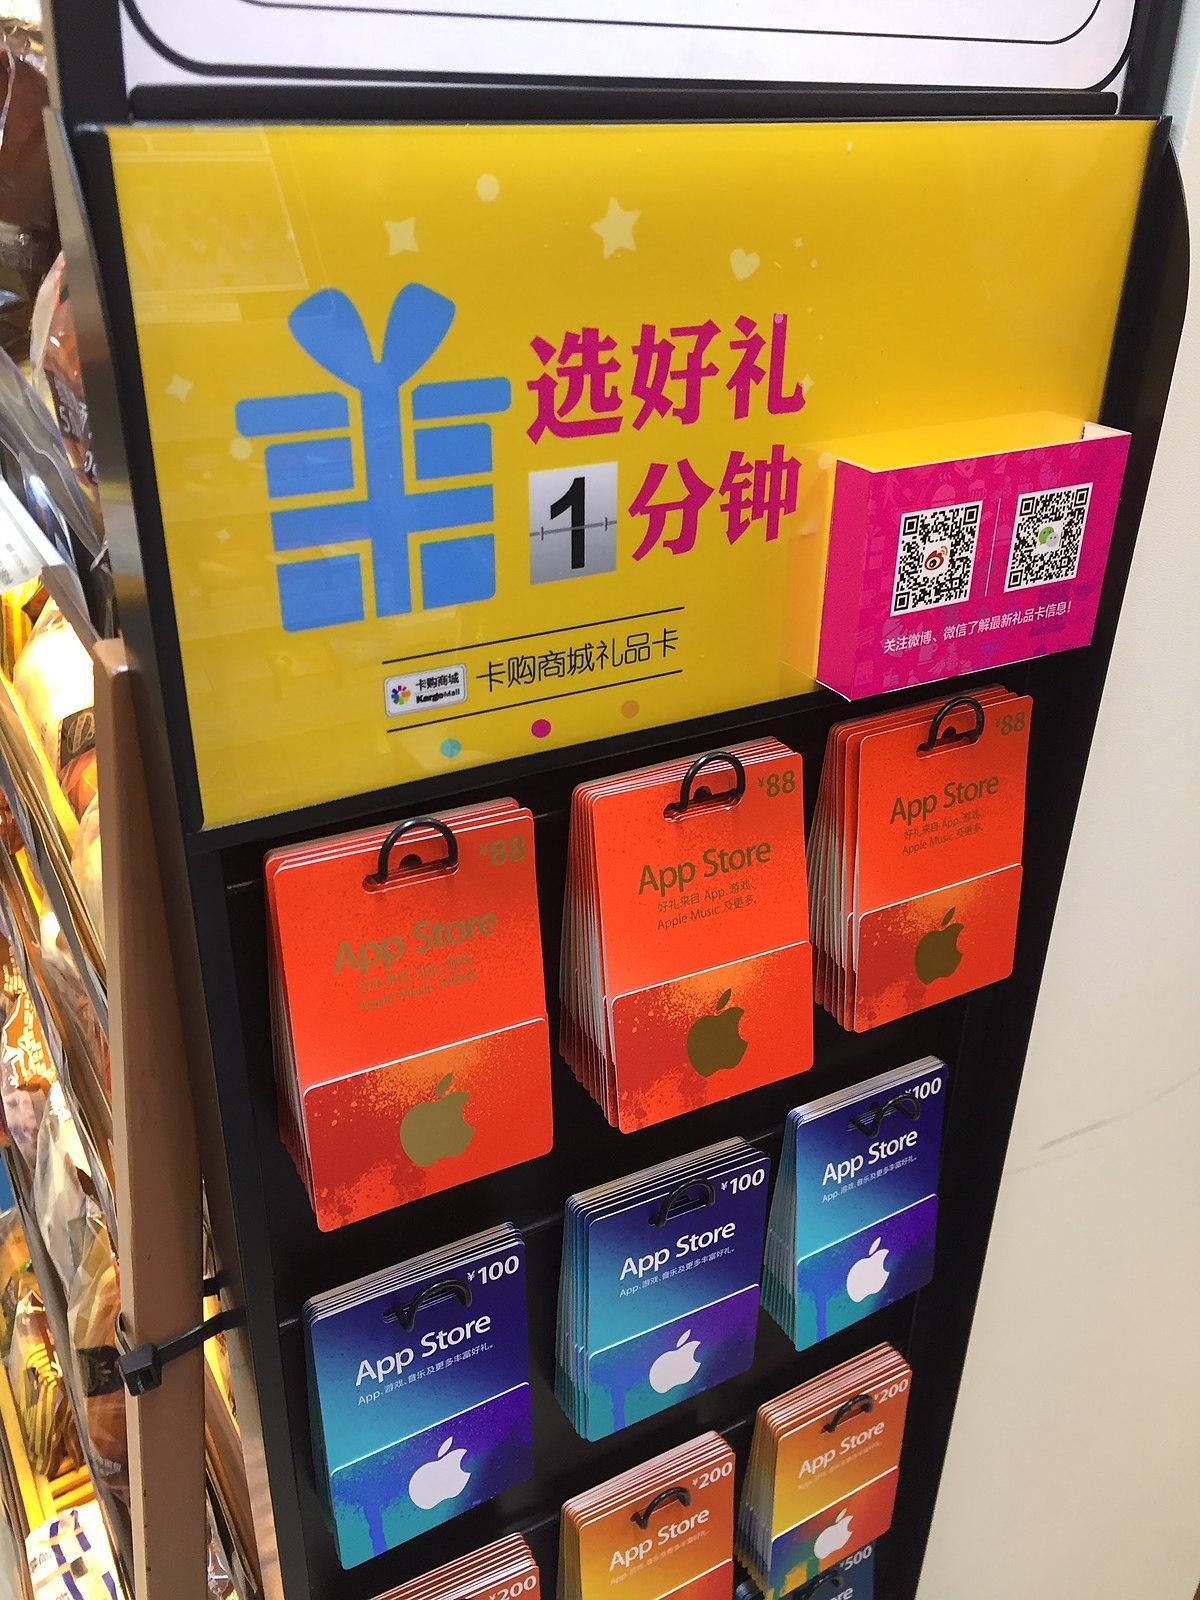 File:App Store Gift Card by Zihexin jpg - Wikimedia Commons